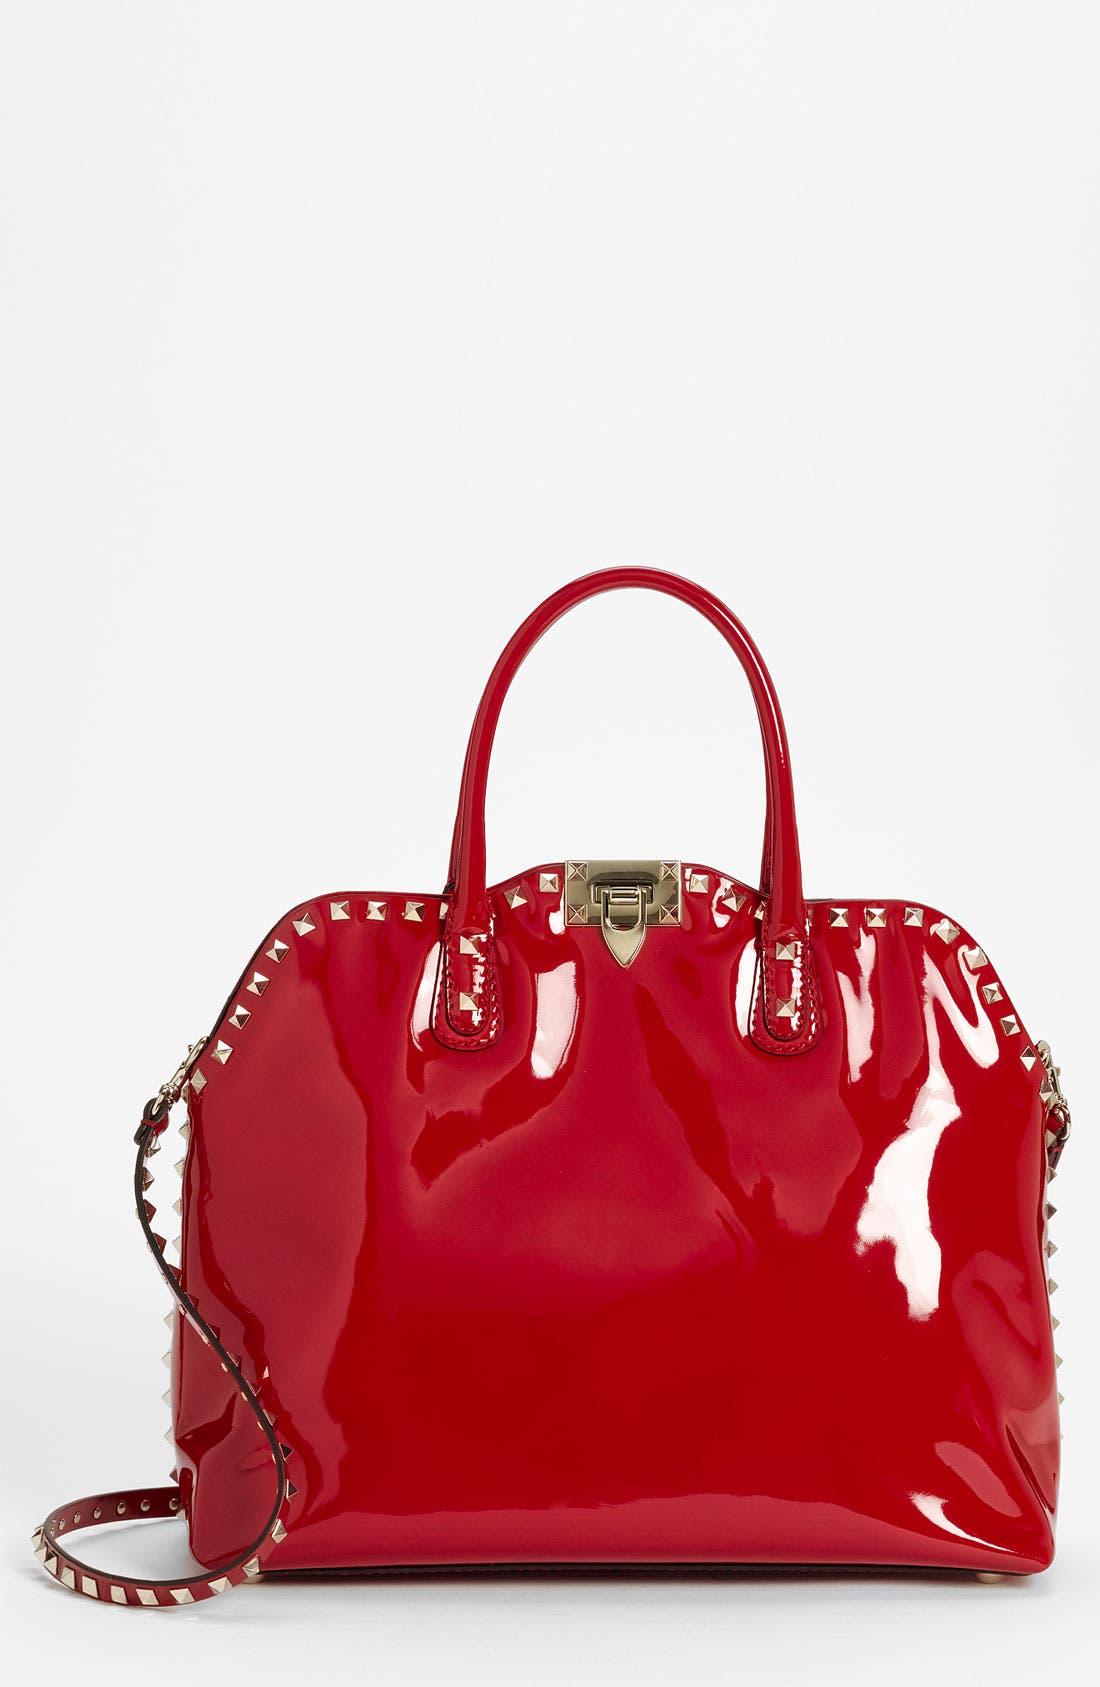 Alternate Image 1 Selected - Valentino 'Rockstud' Patent Leather Dome Handbag